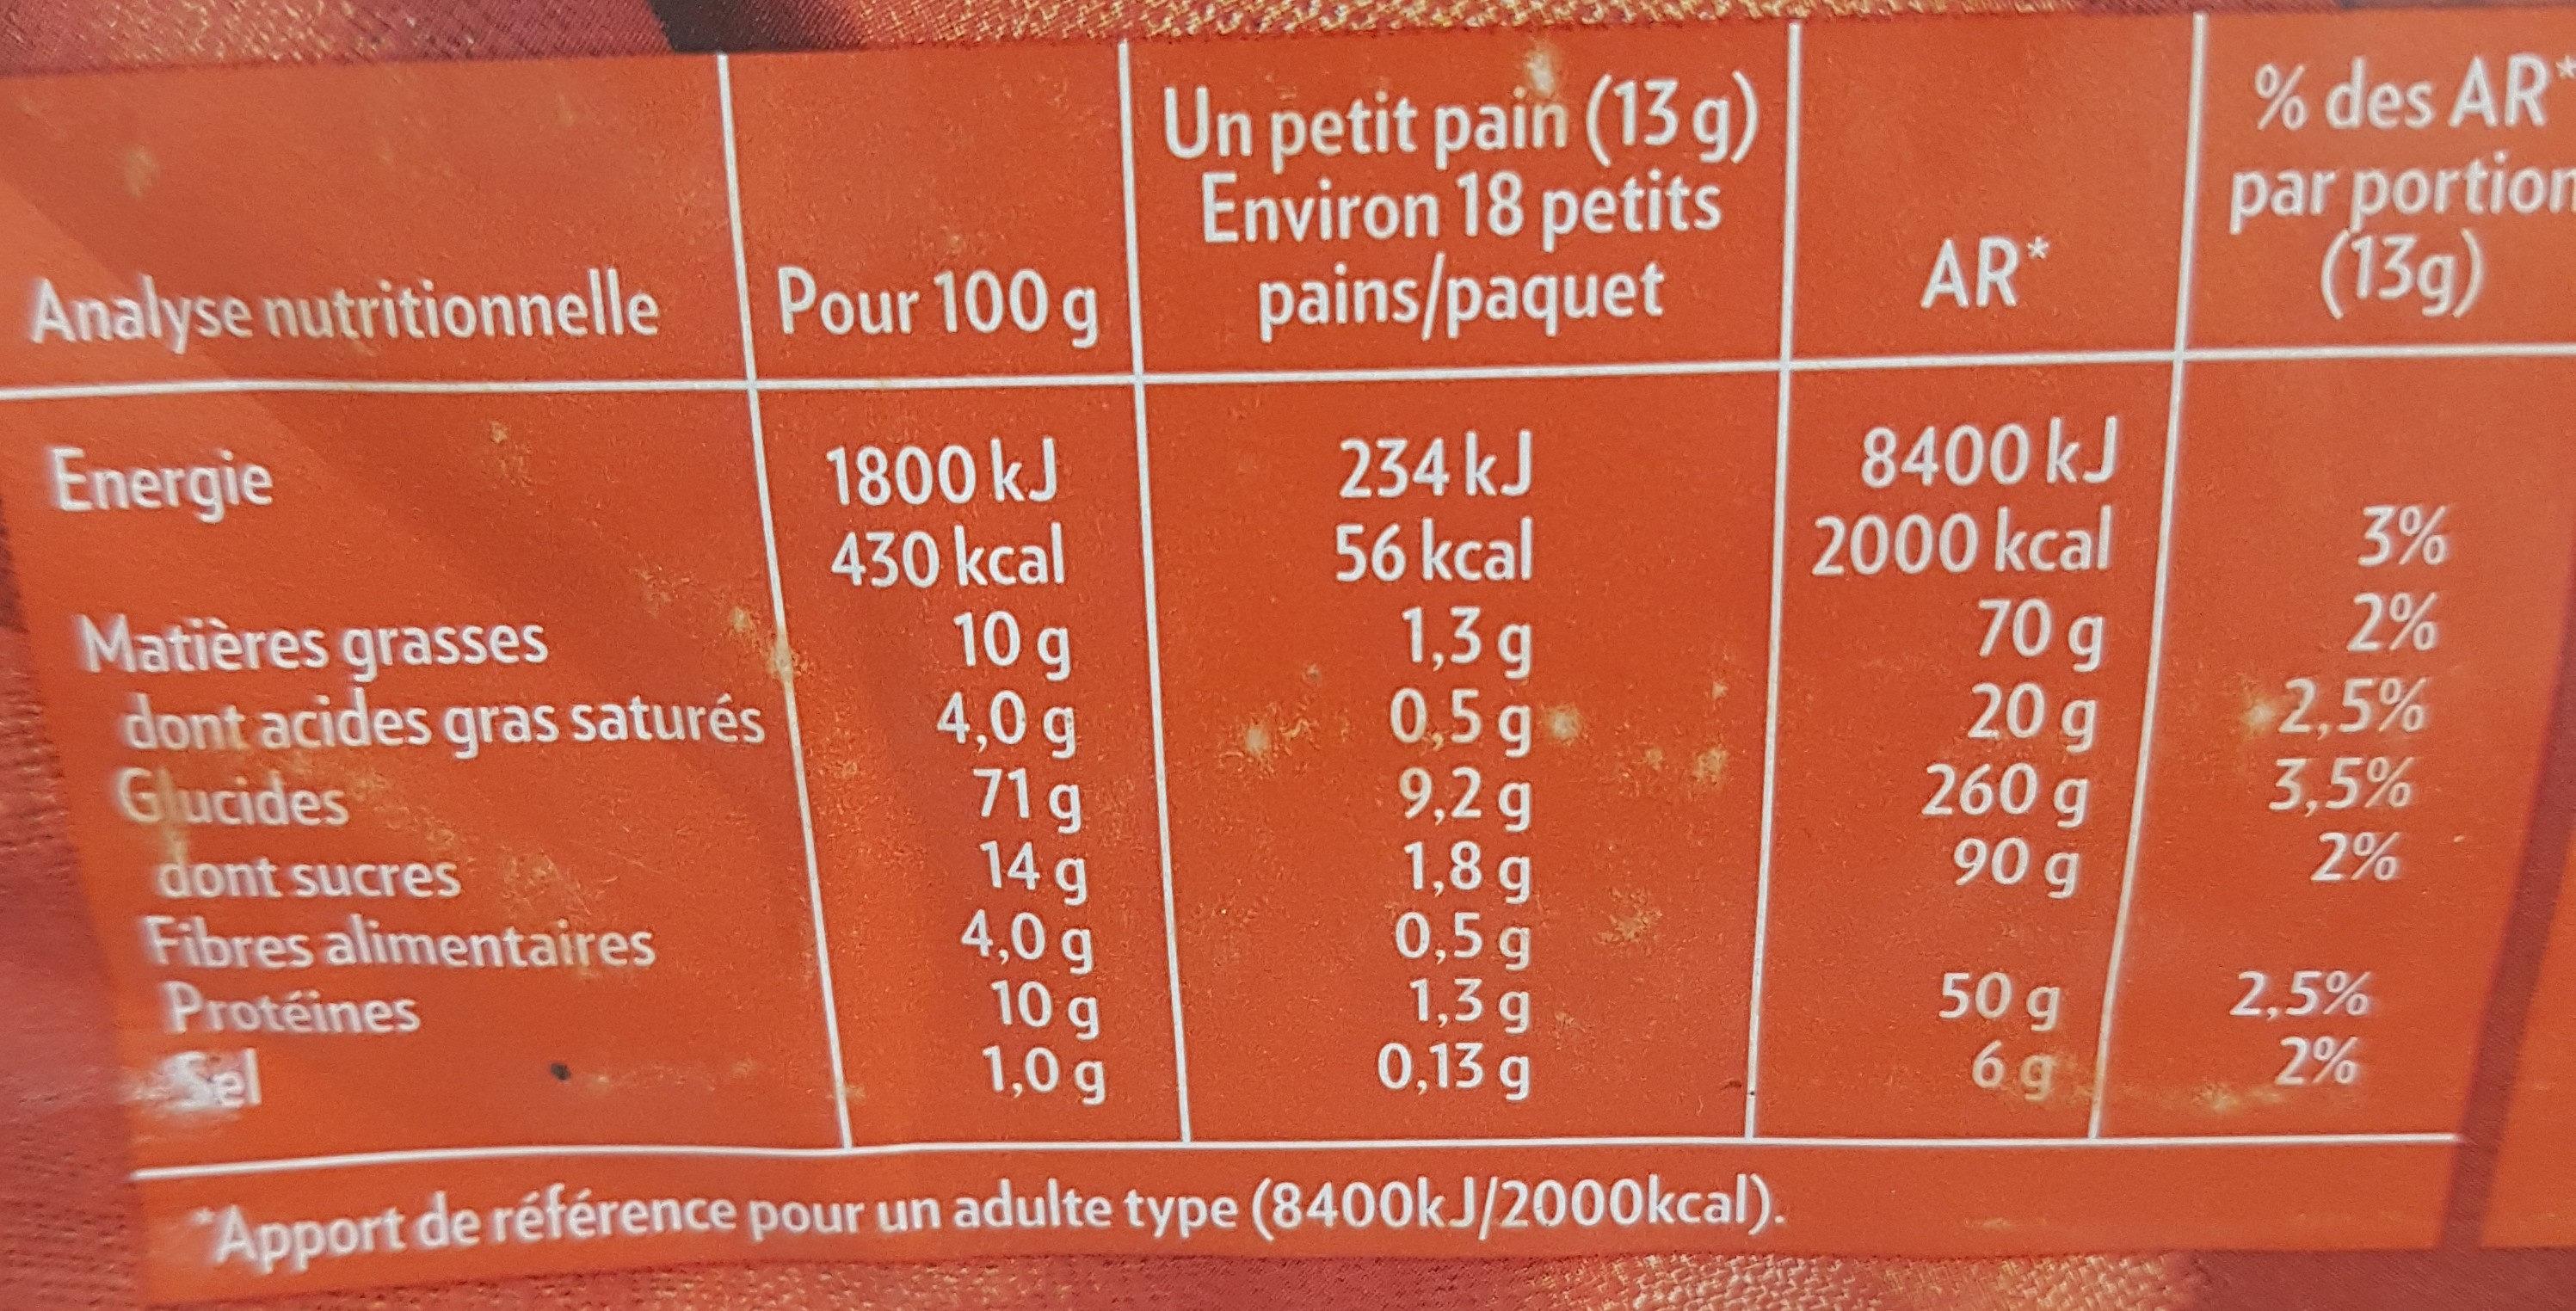 Krisprolls briochée - Nutrition facts - fr